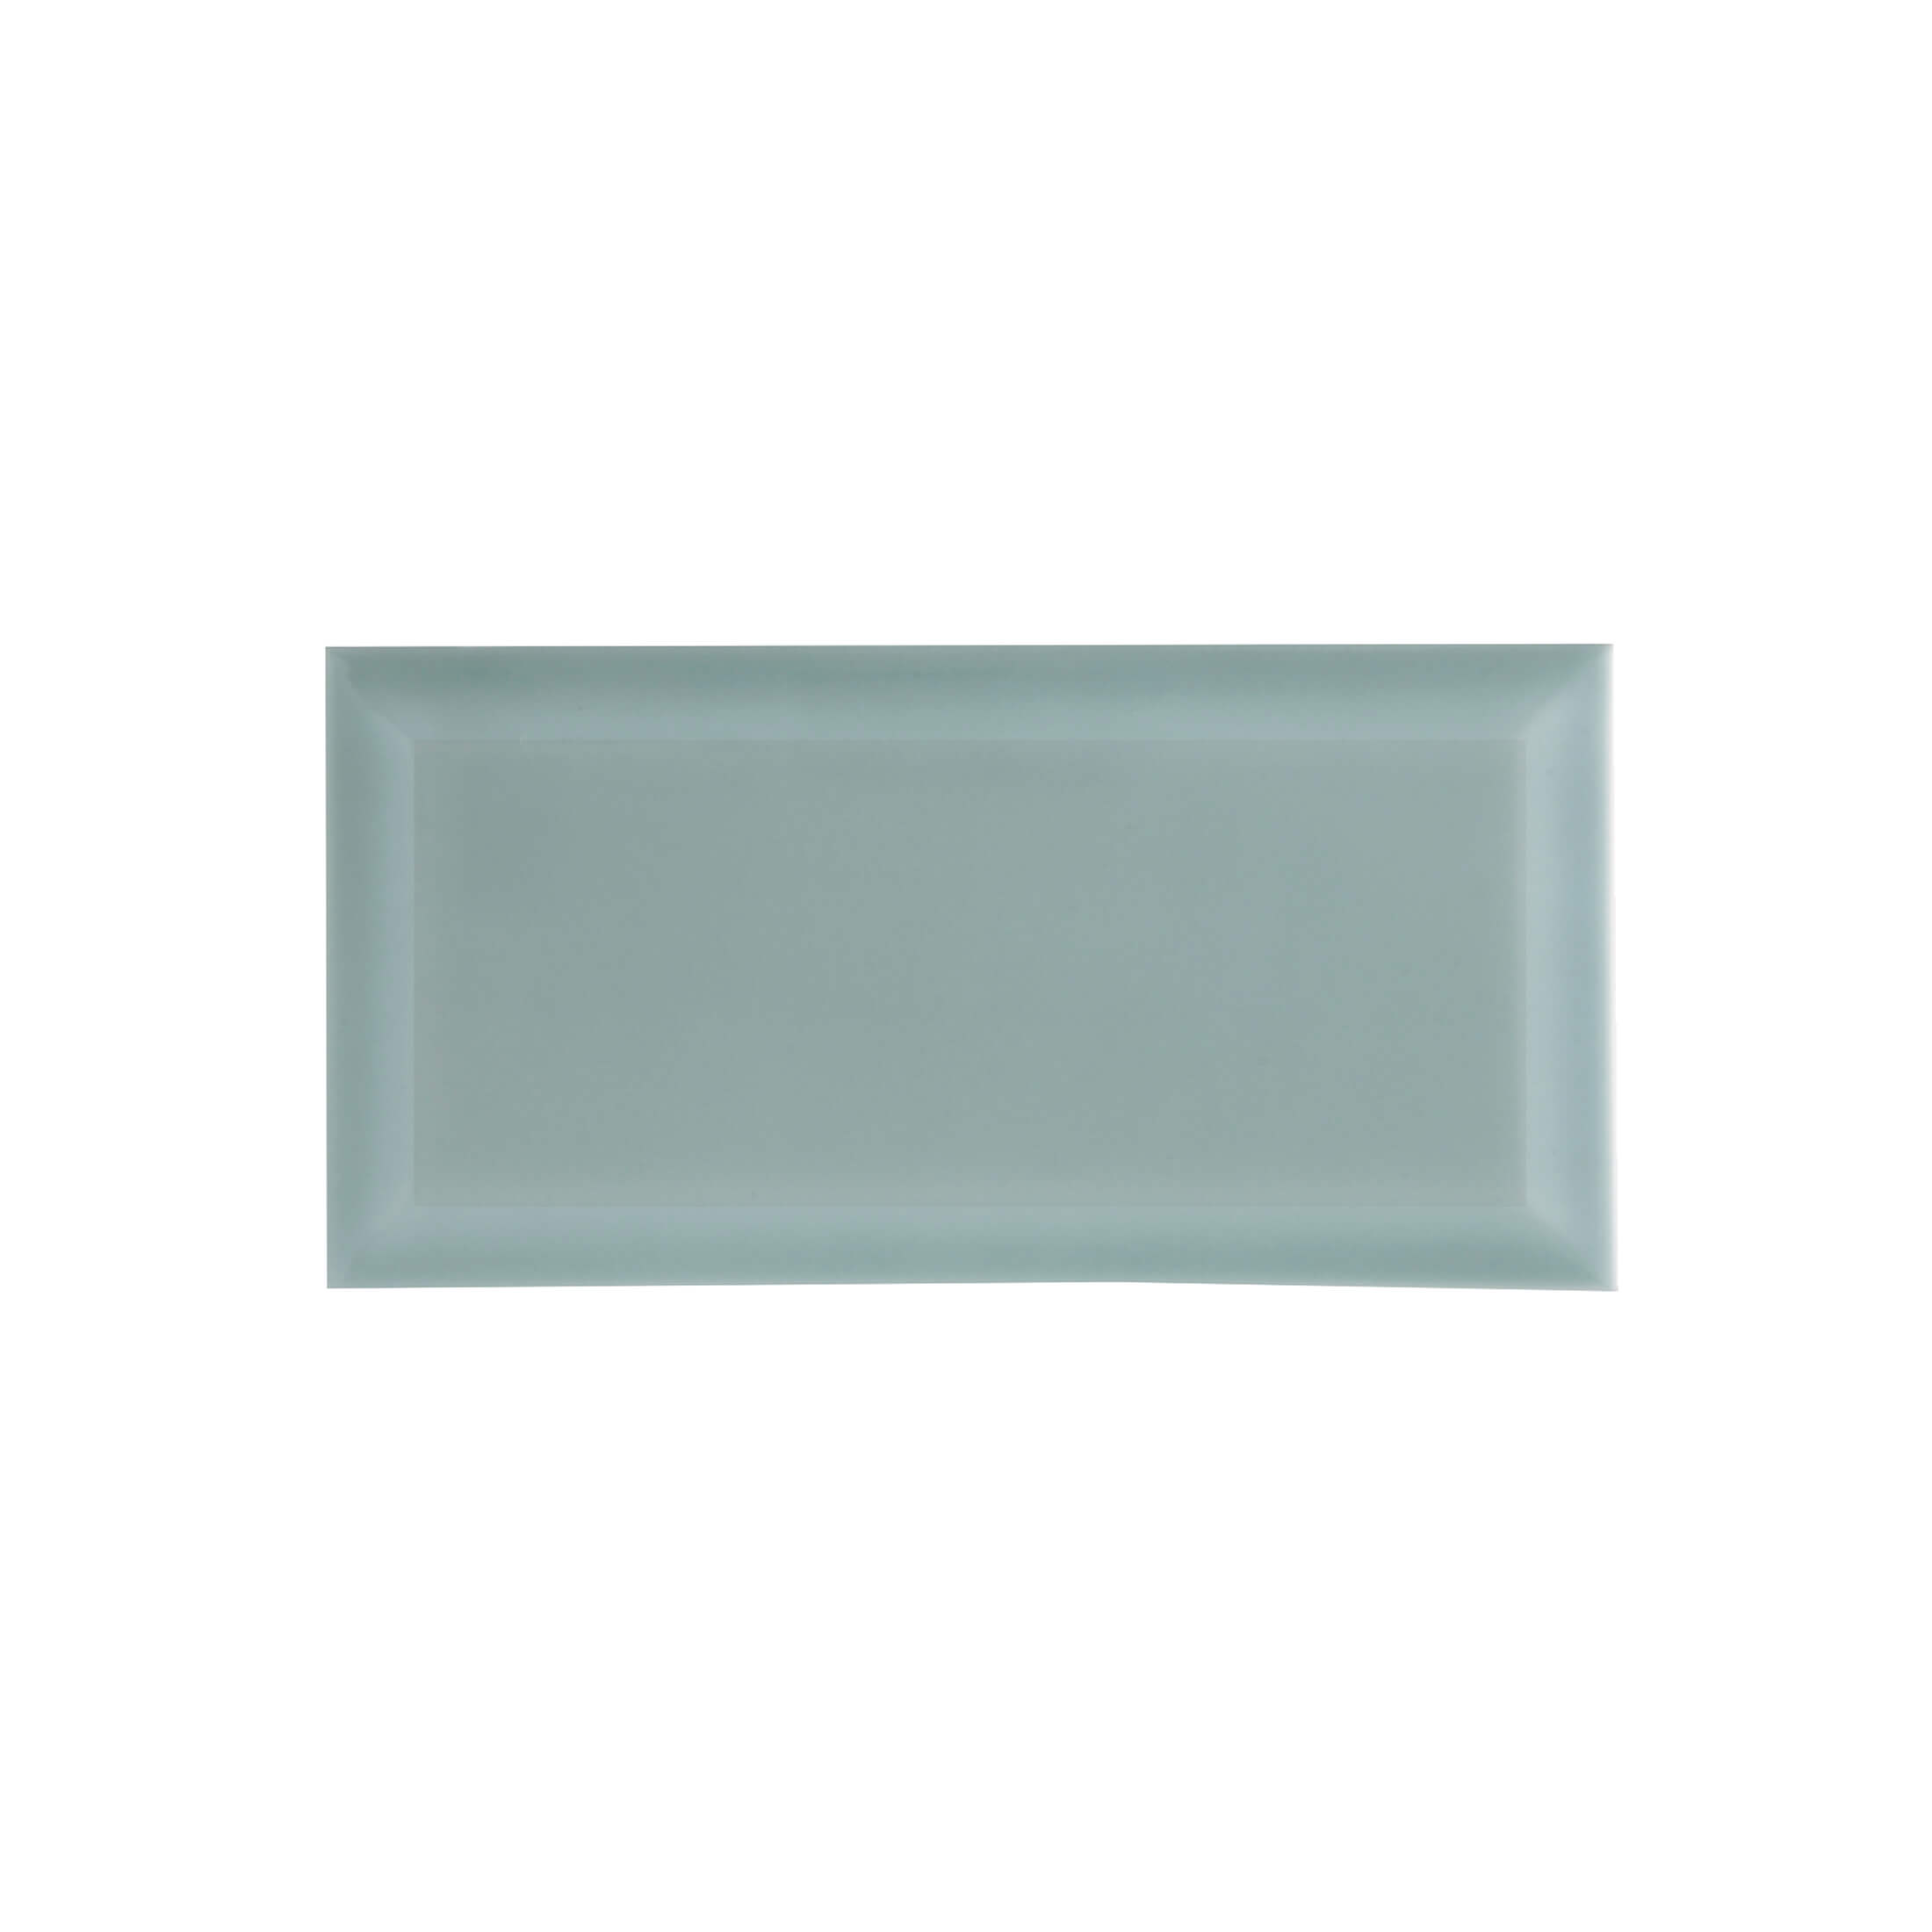 ADNE2057 - BISELADO PB - 10 cm X 20 cm